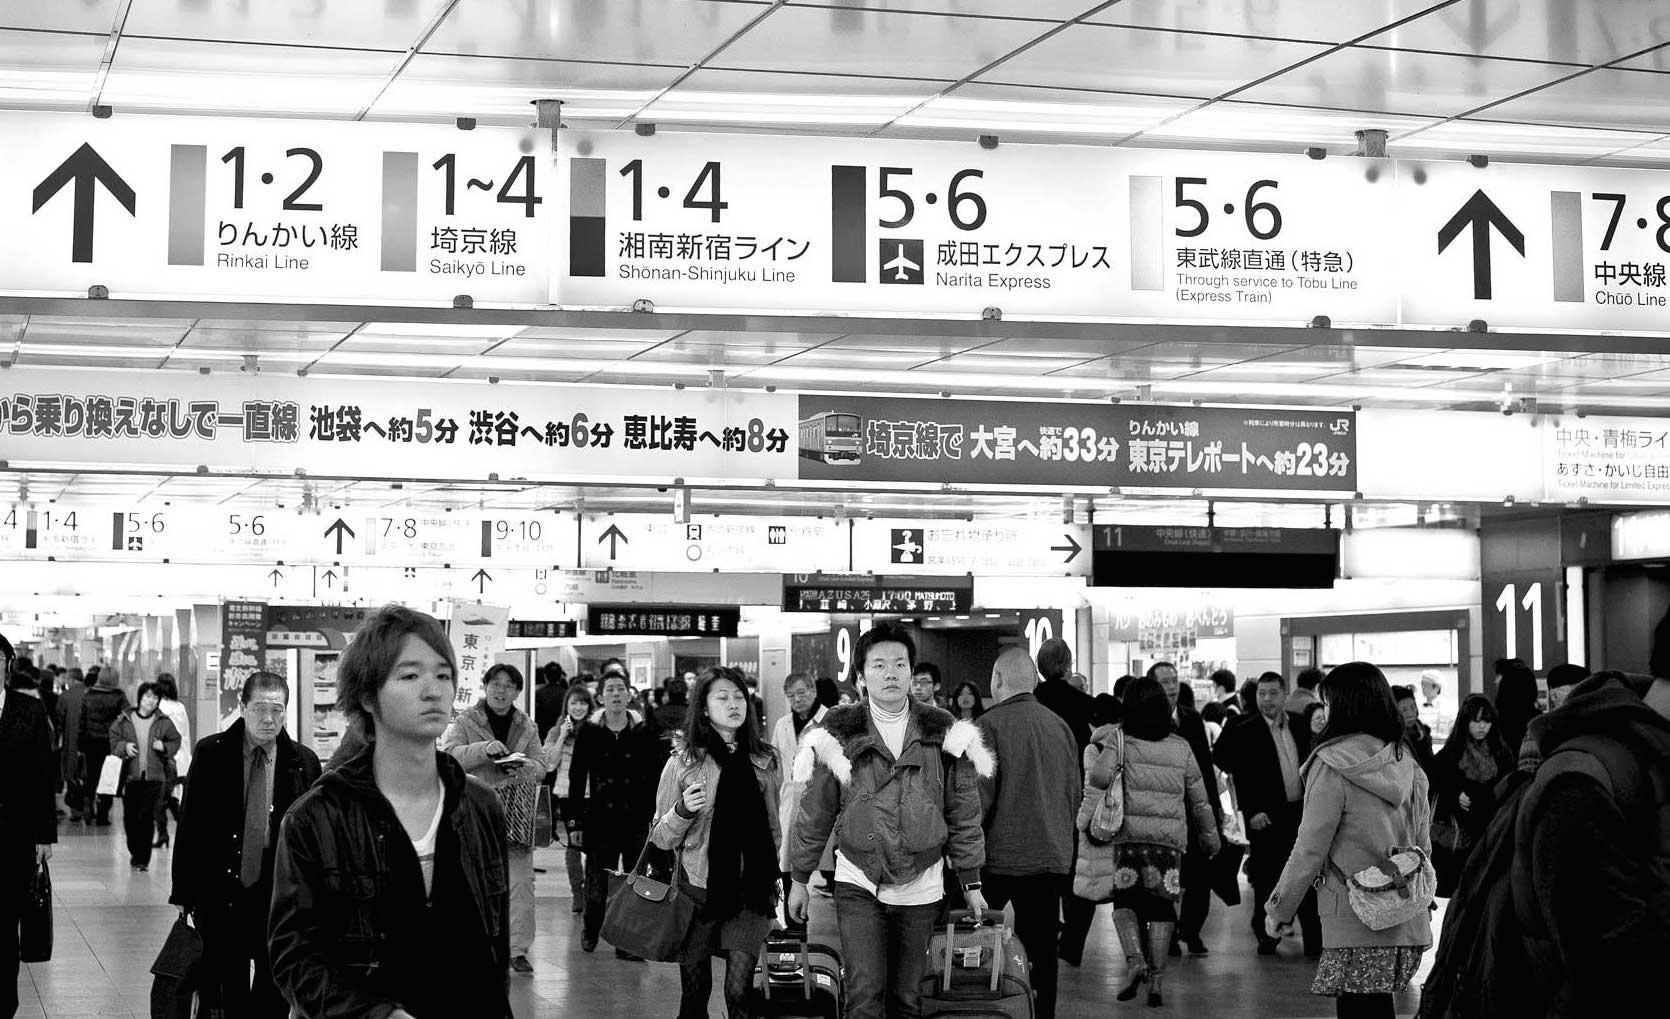 Black and white image of a crowd in Shinjuku station, Tokyo